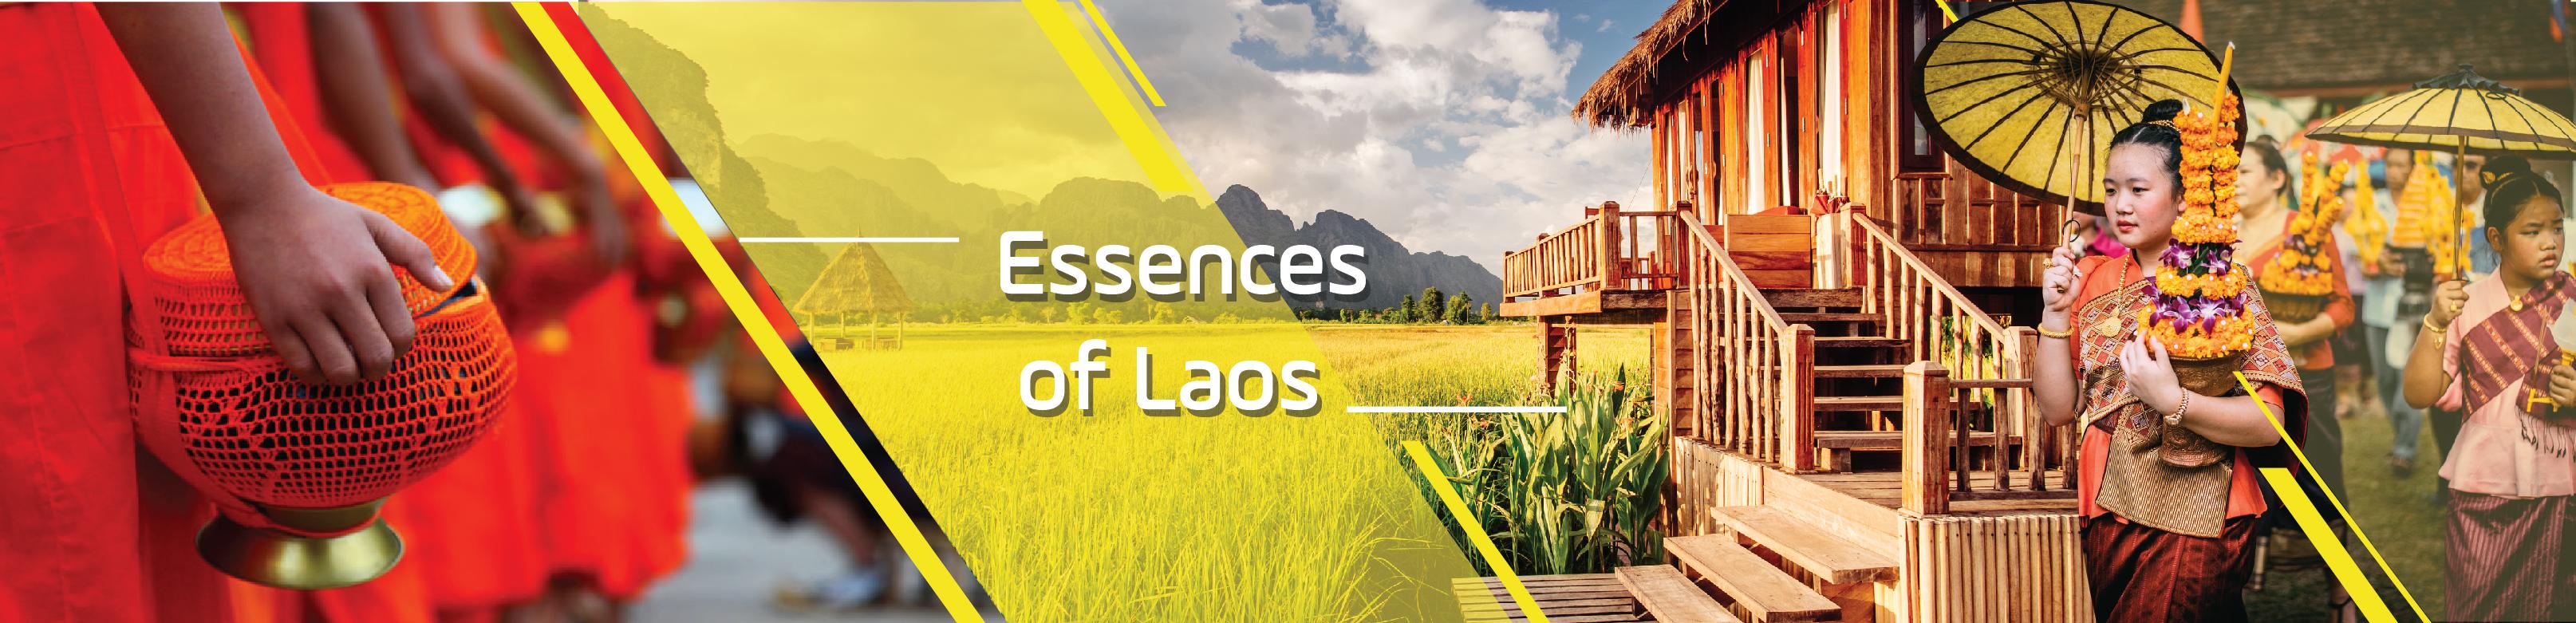 http://indochinatravelland.com/essences-of-laos-5days/4nights